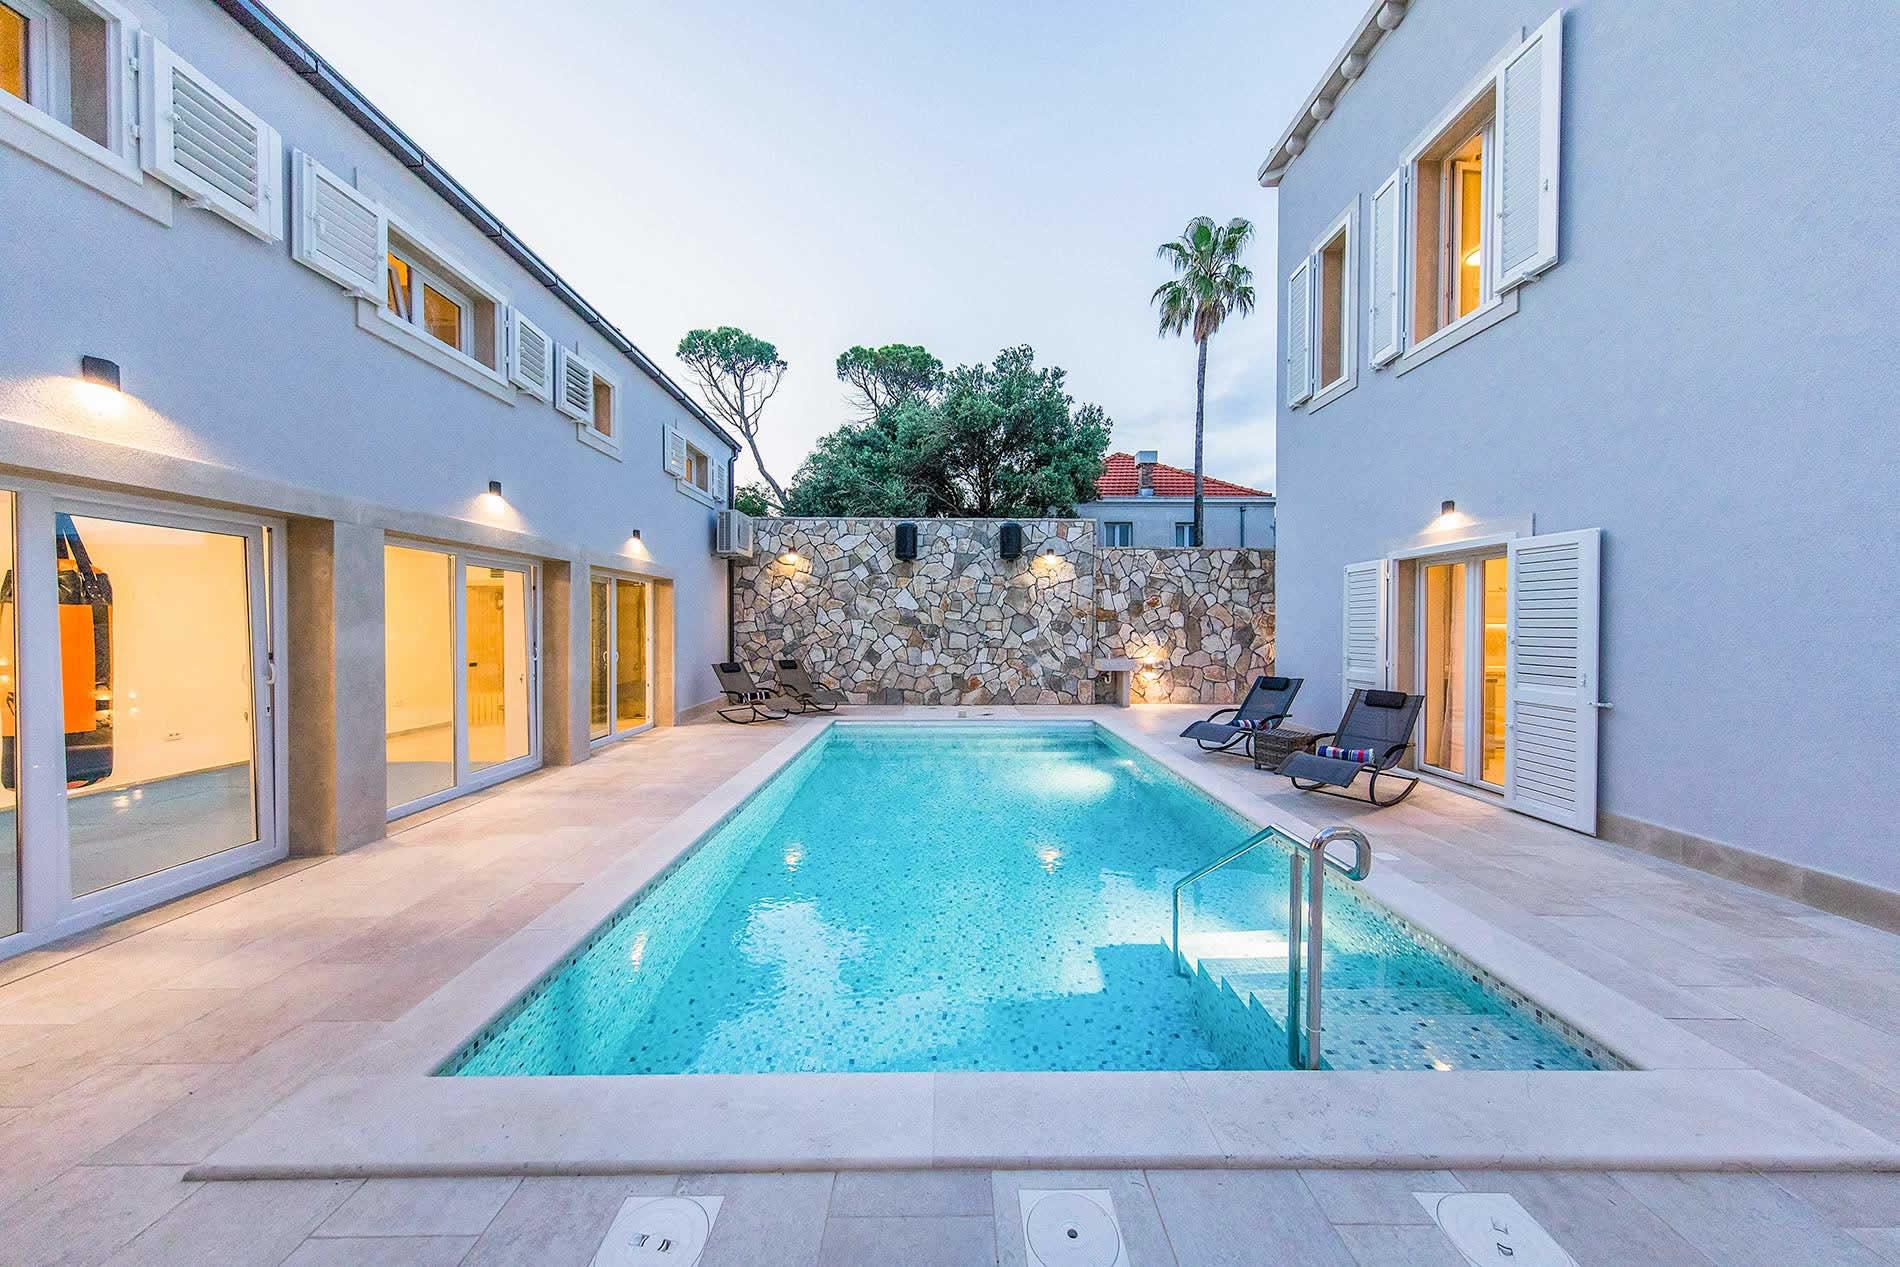 Villa Lapad Residence in Dubrovnik - sleeps 10 people